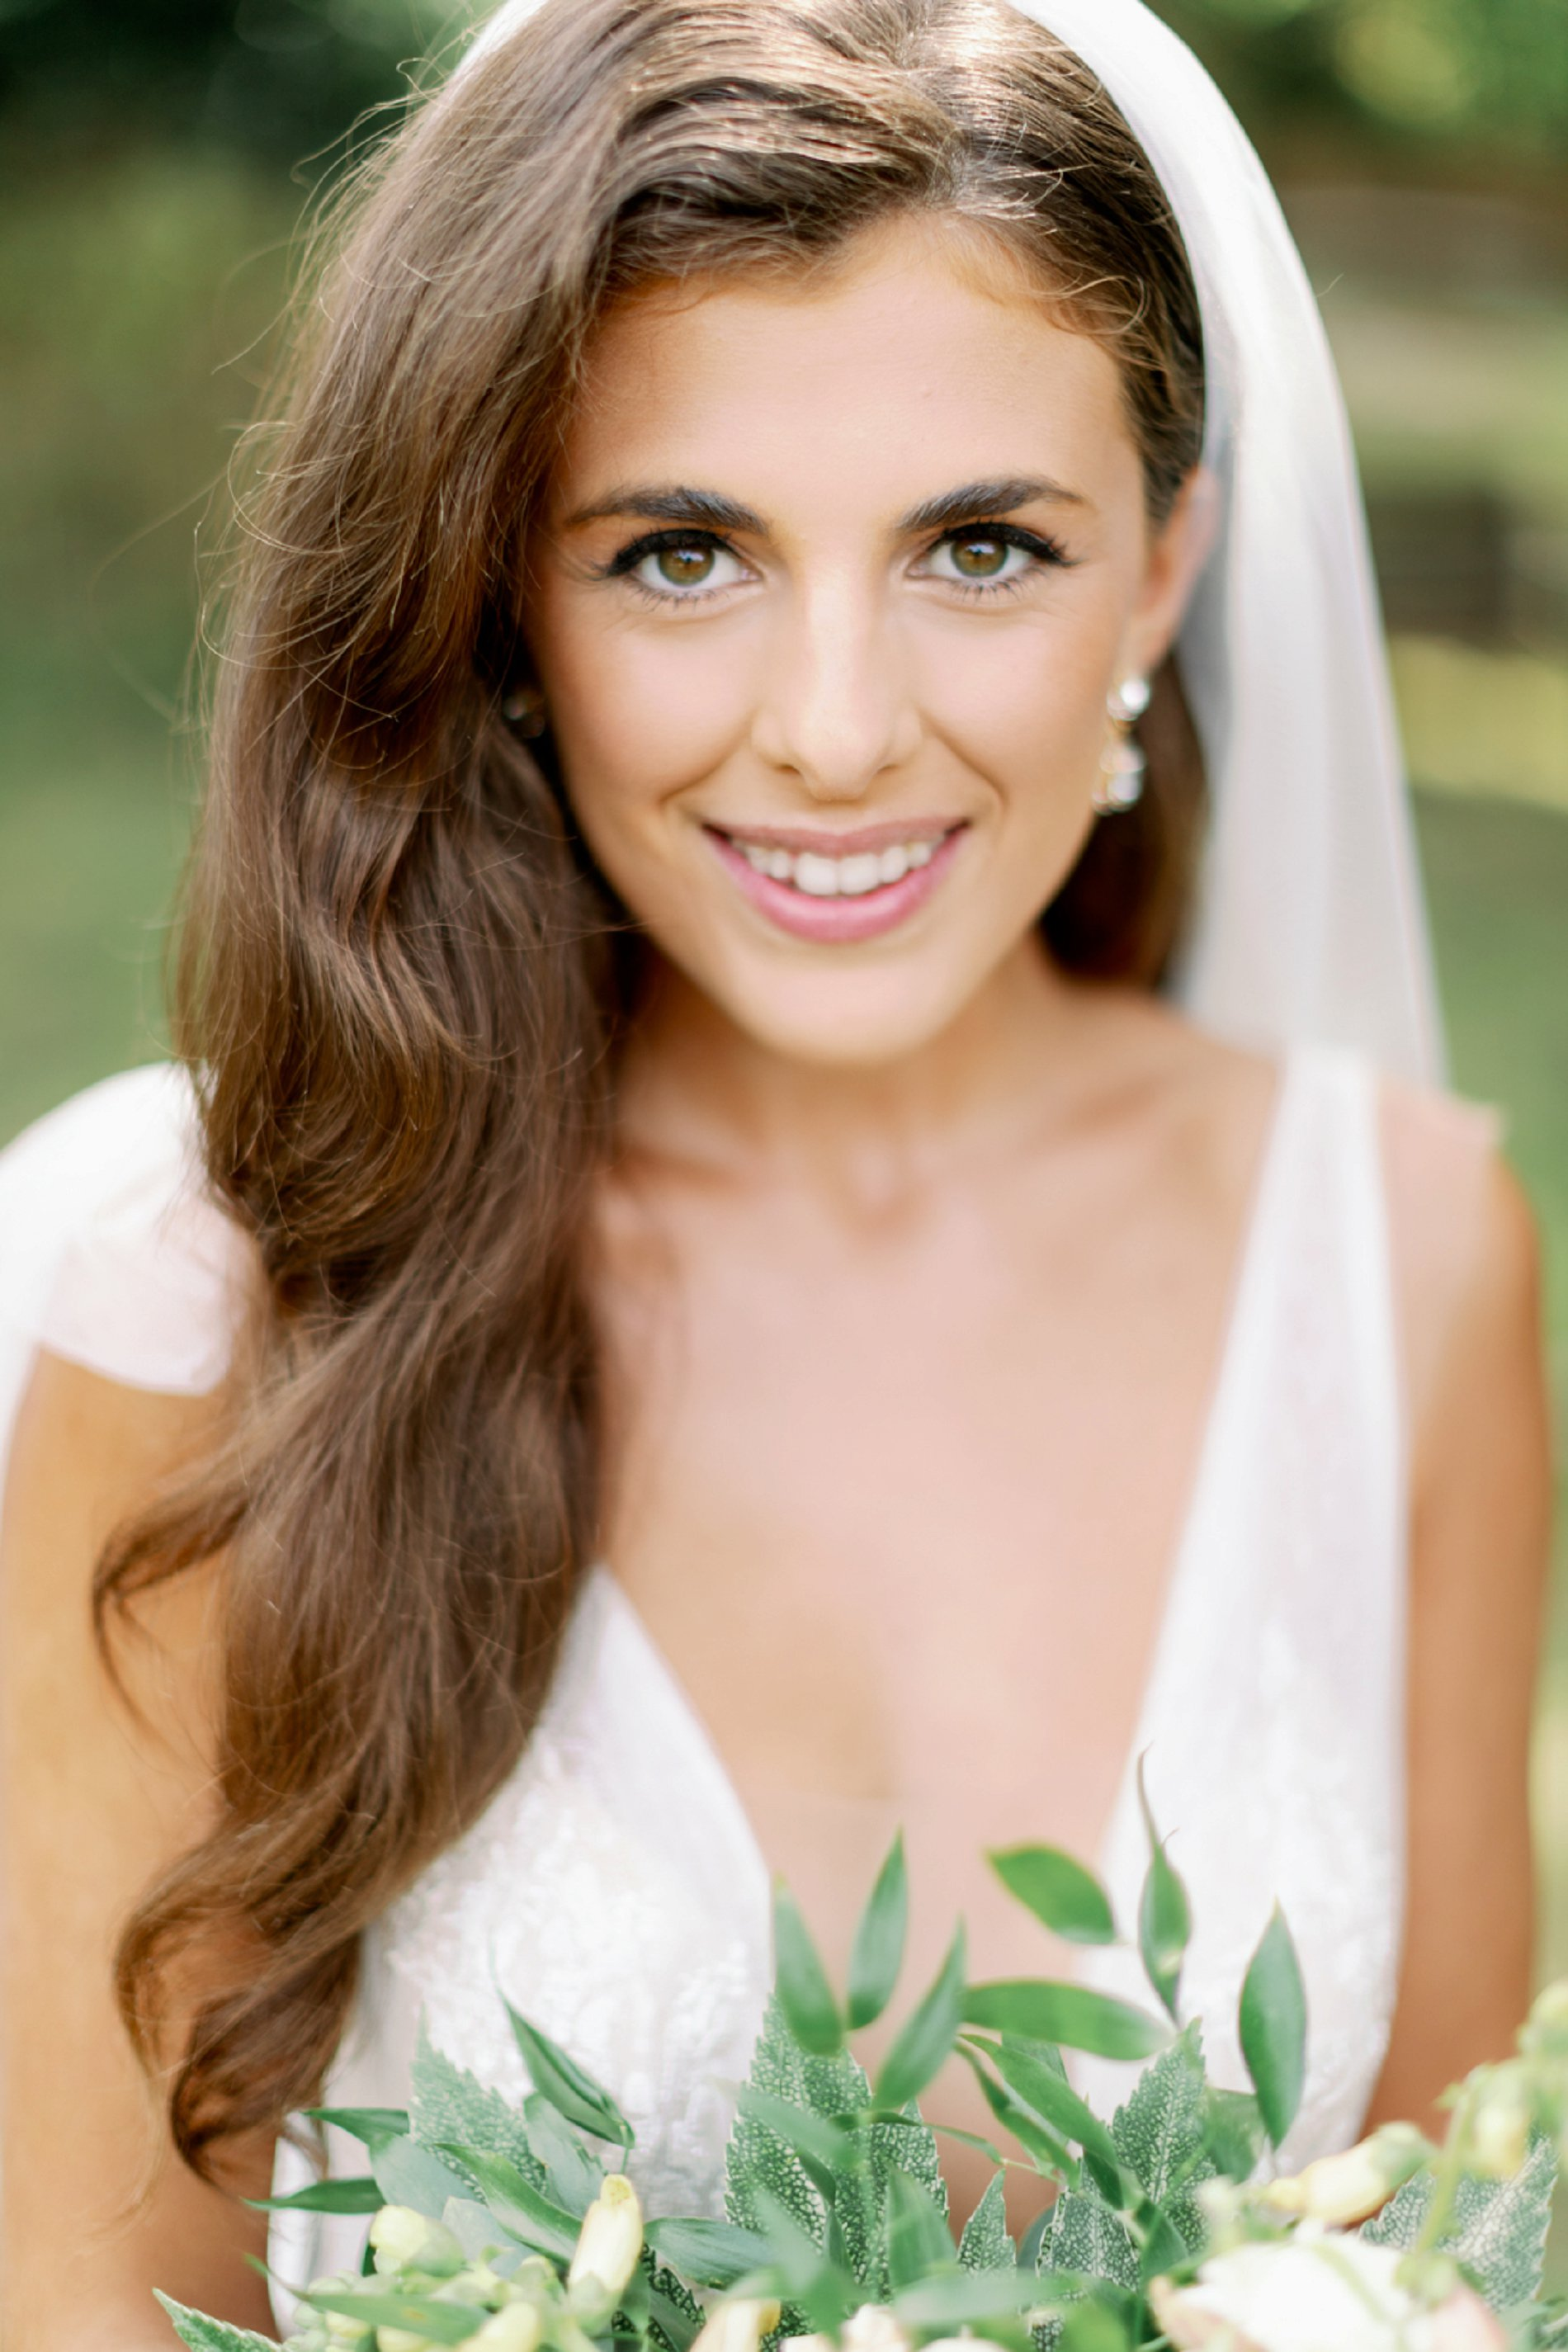 An Elegant Styled Shoot at Baddow Park House (c) Camilla J Hards (20)